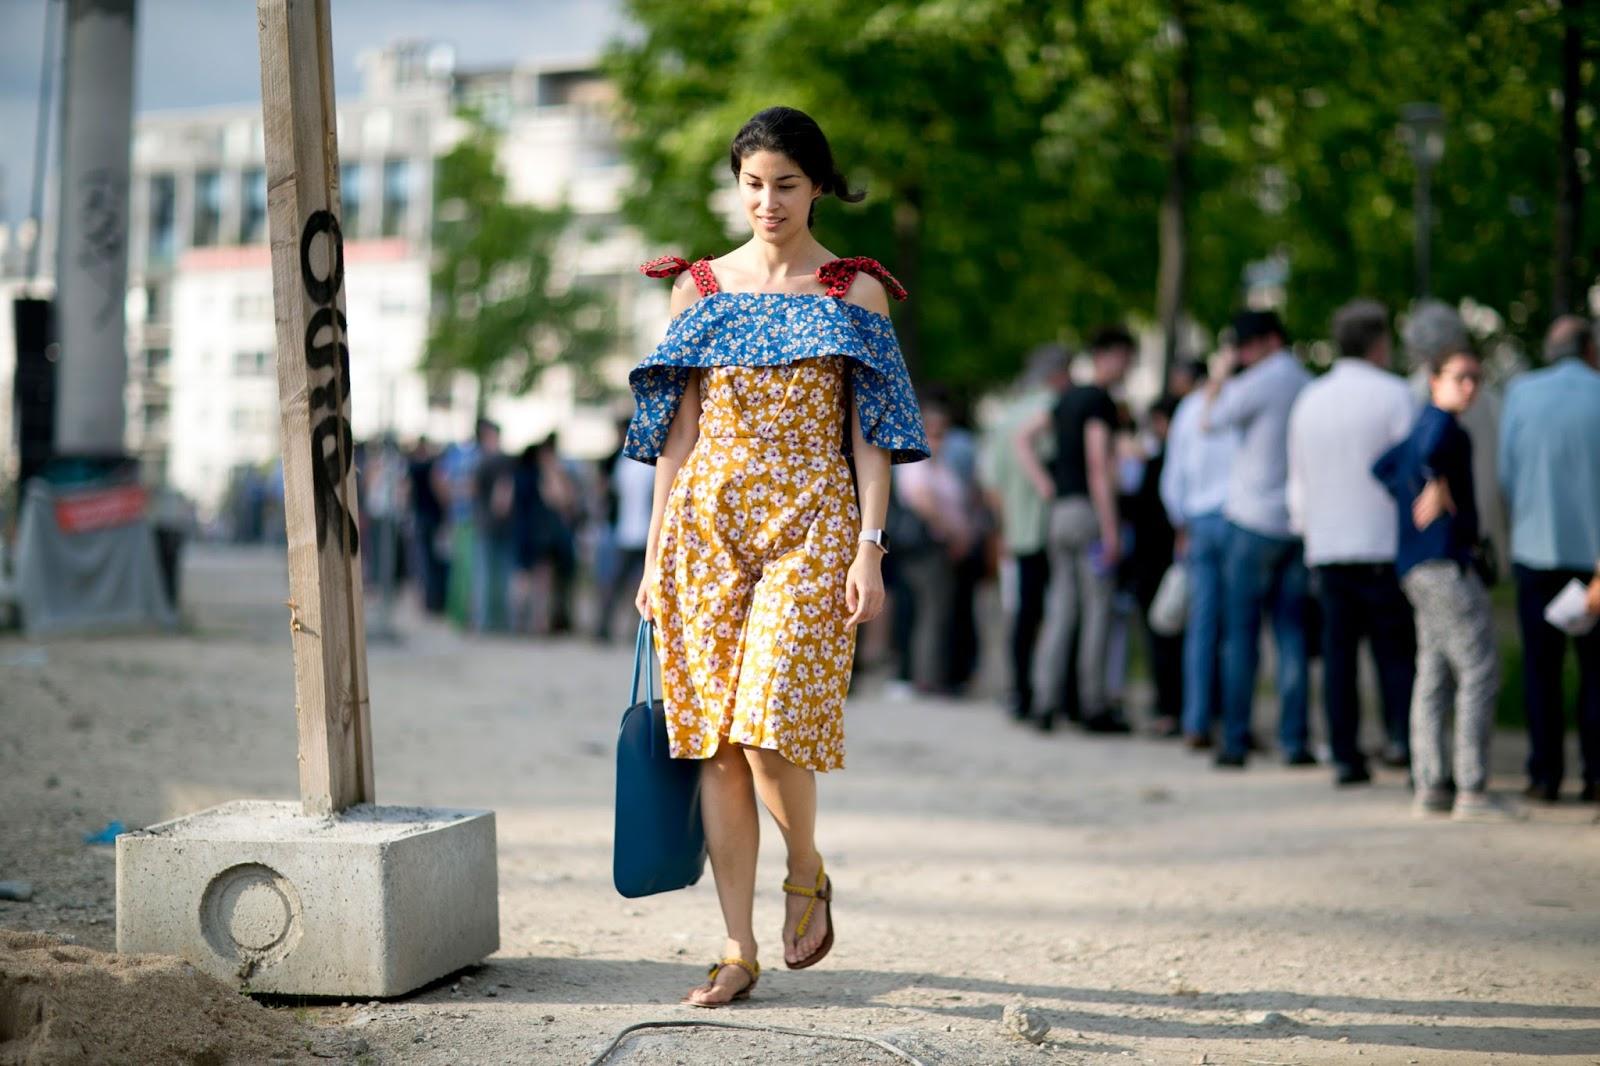 Street Style: Caroline Issa's Floral Dress